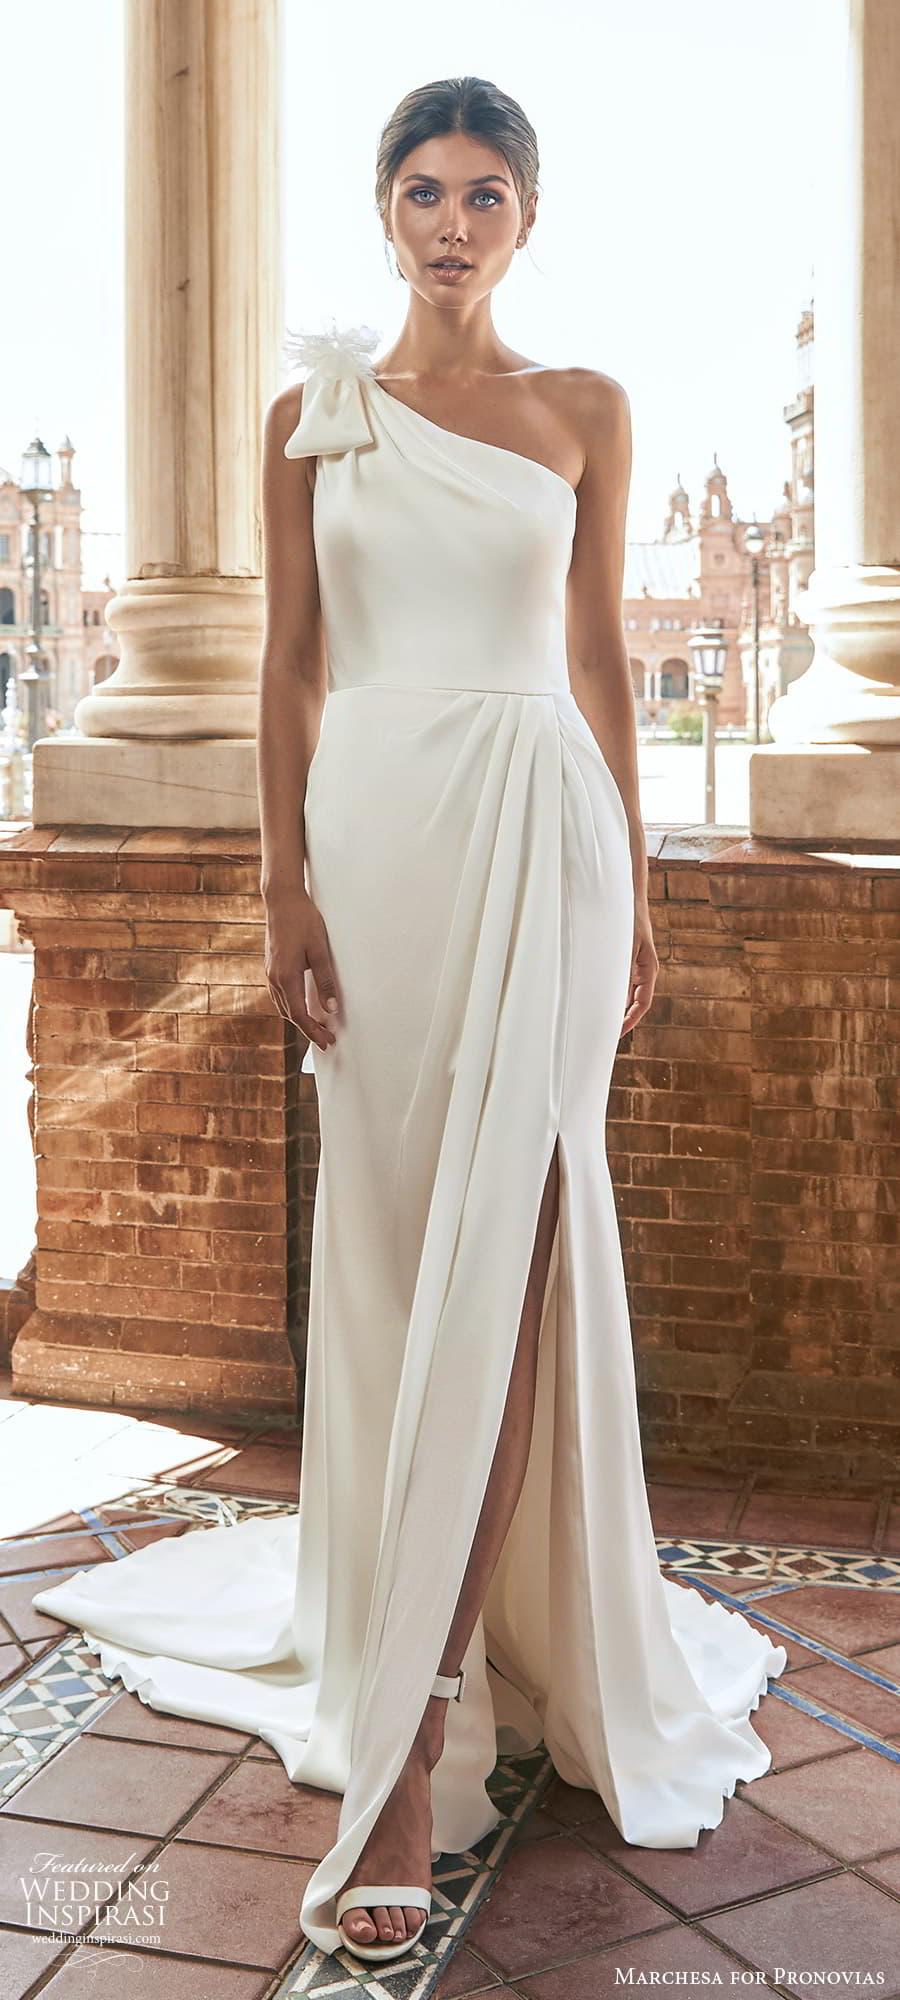 marchesa for pronovias 2022 bridal sleeveless one shoulder straps asymmetric neckline clean minimalist sheath wedding dress slit skirt sweep train 4) mv